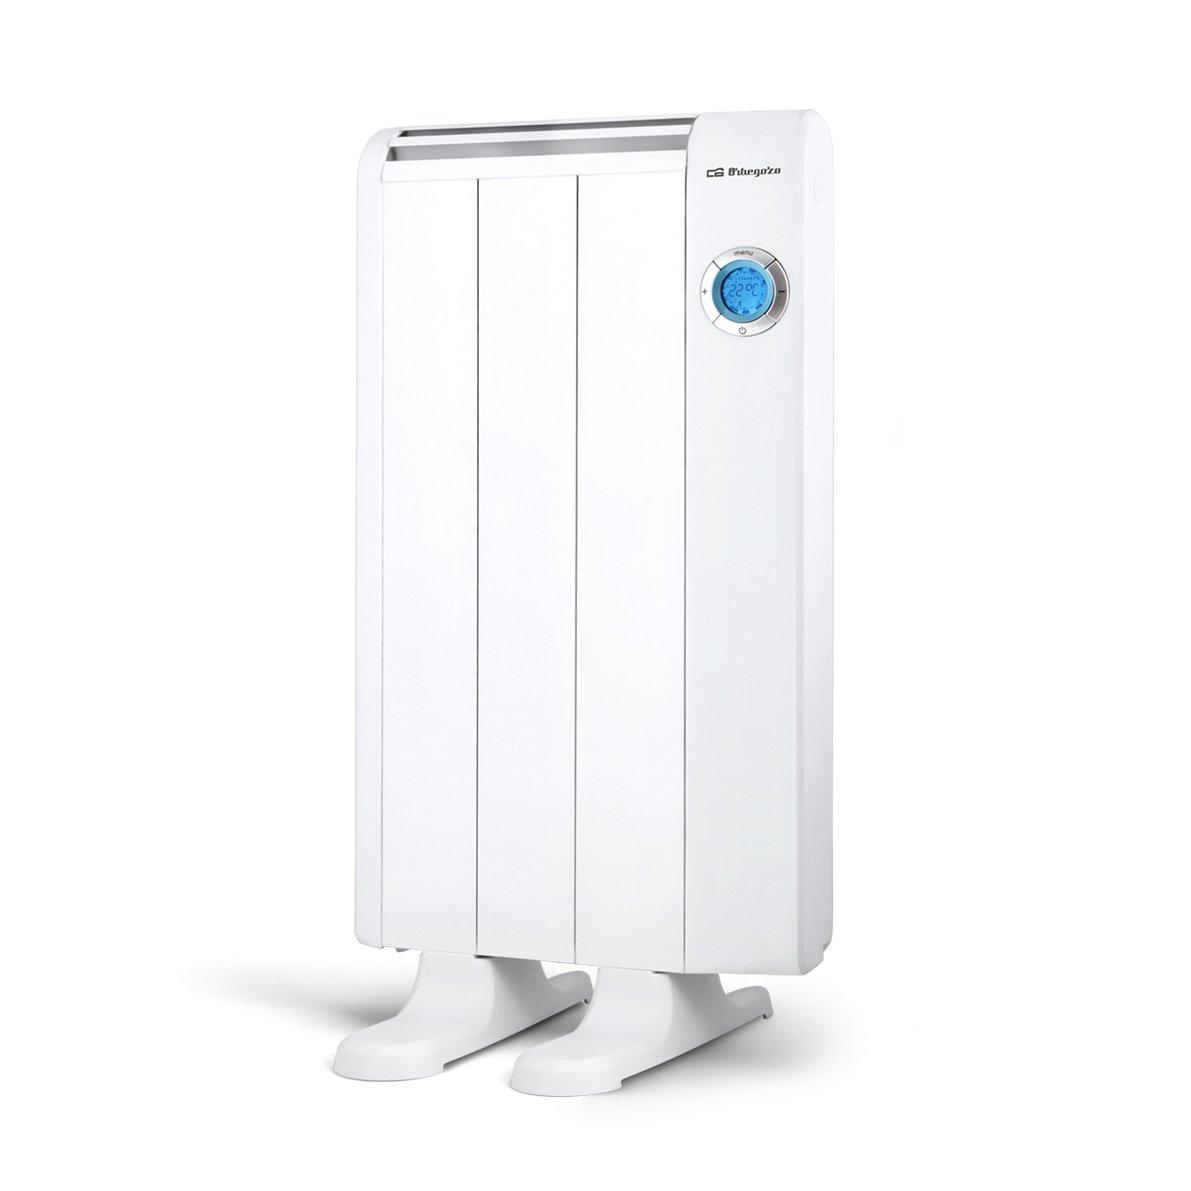 Orbegozo RRE 510 Emisor térmico, 500 W, Aluminio, Color Blanco: Amazon.es: Hogar